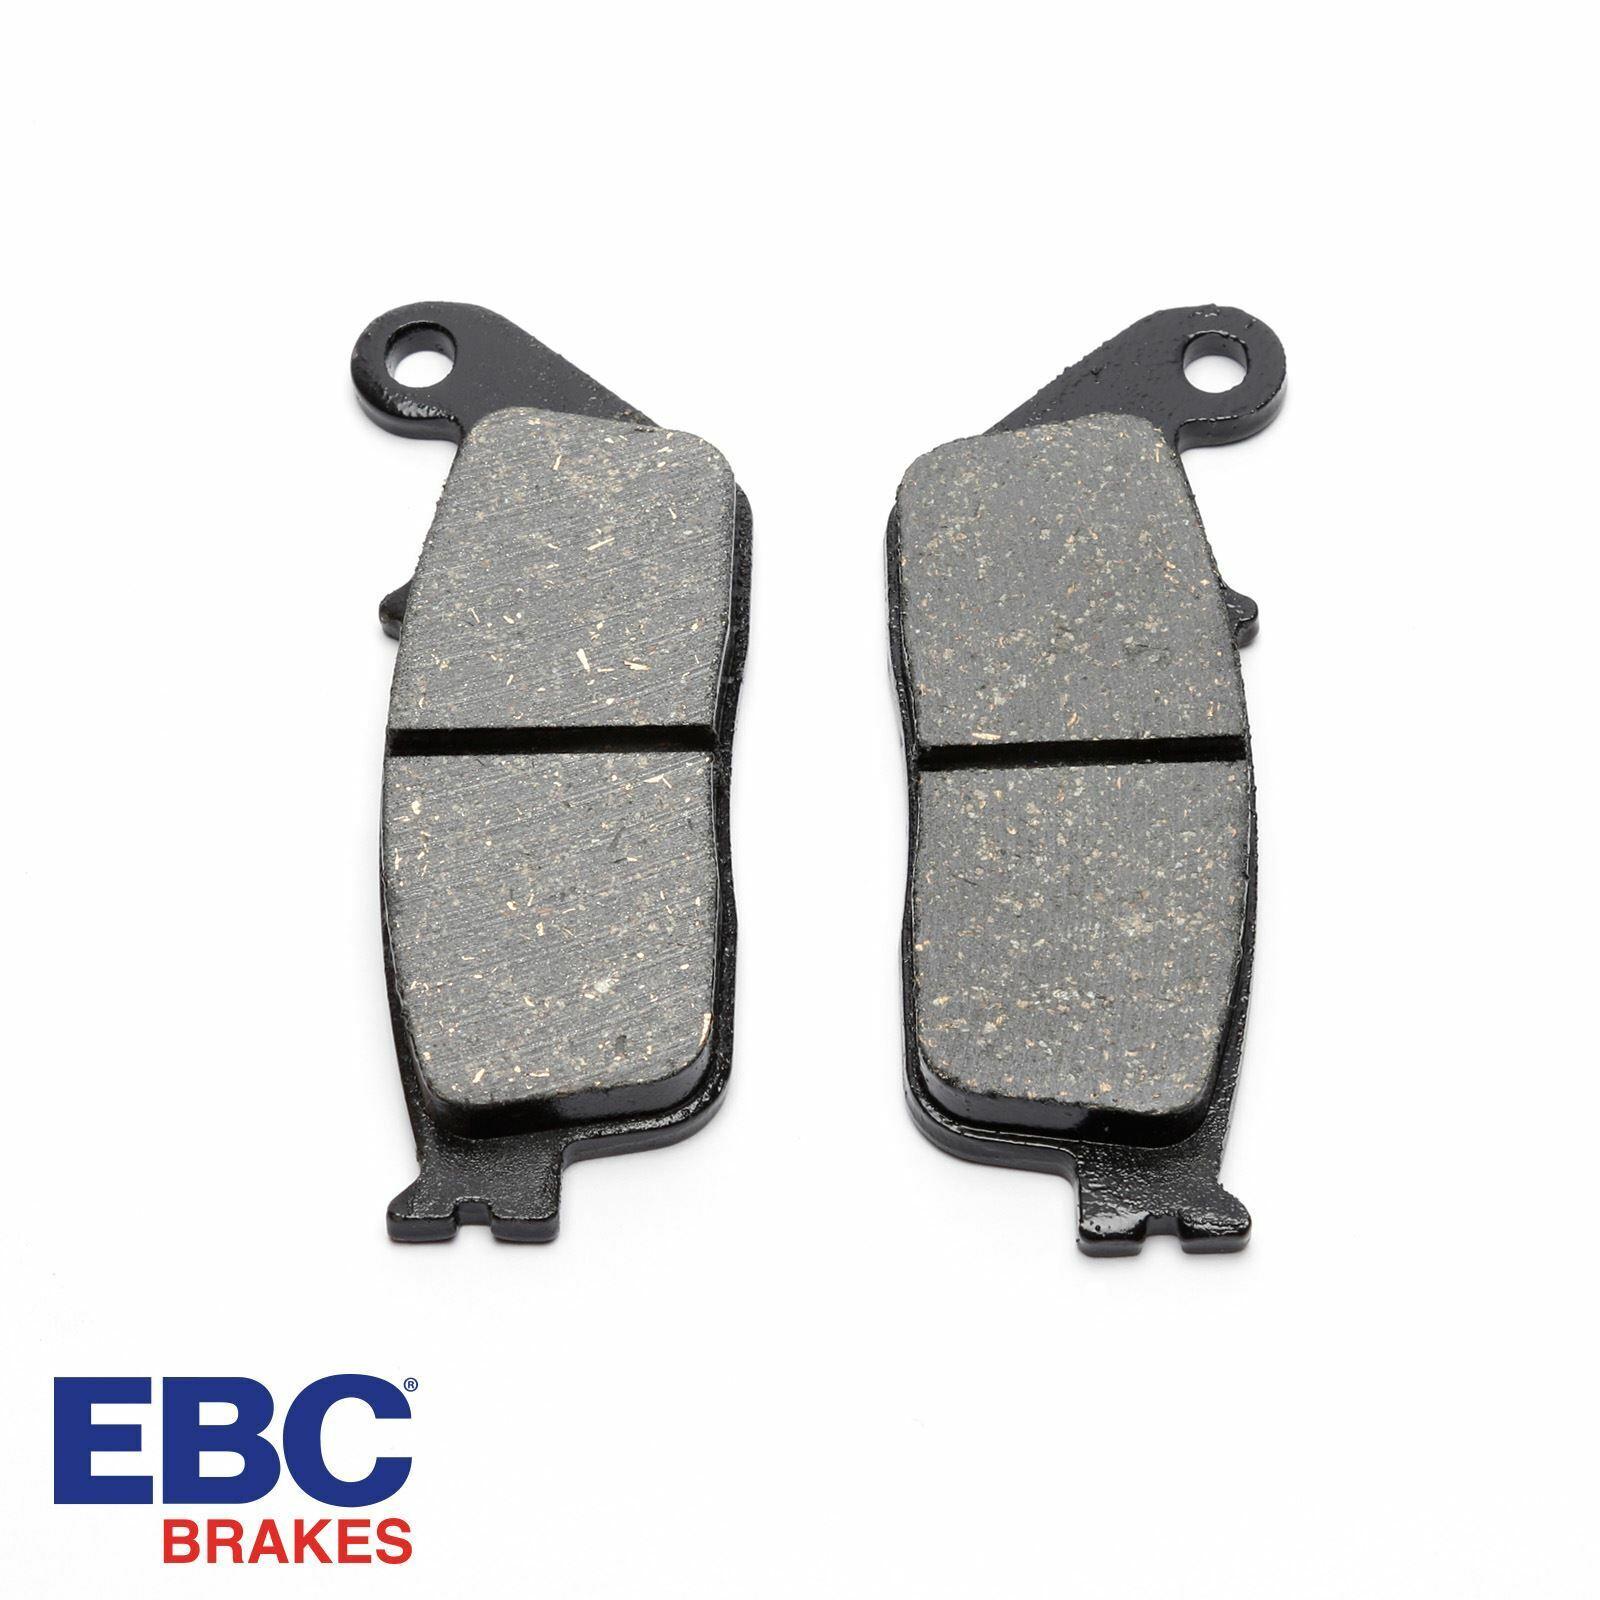 EBC FA174HH Replacement Brake Pads for Rear Yamaha FZ1-S Fazer ABS 08-13